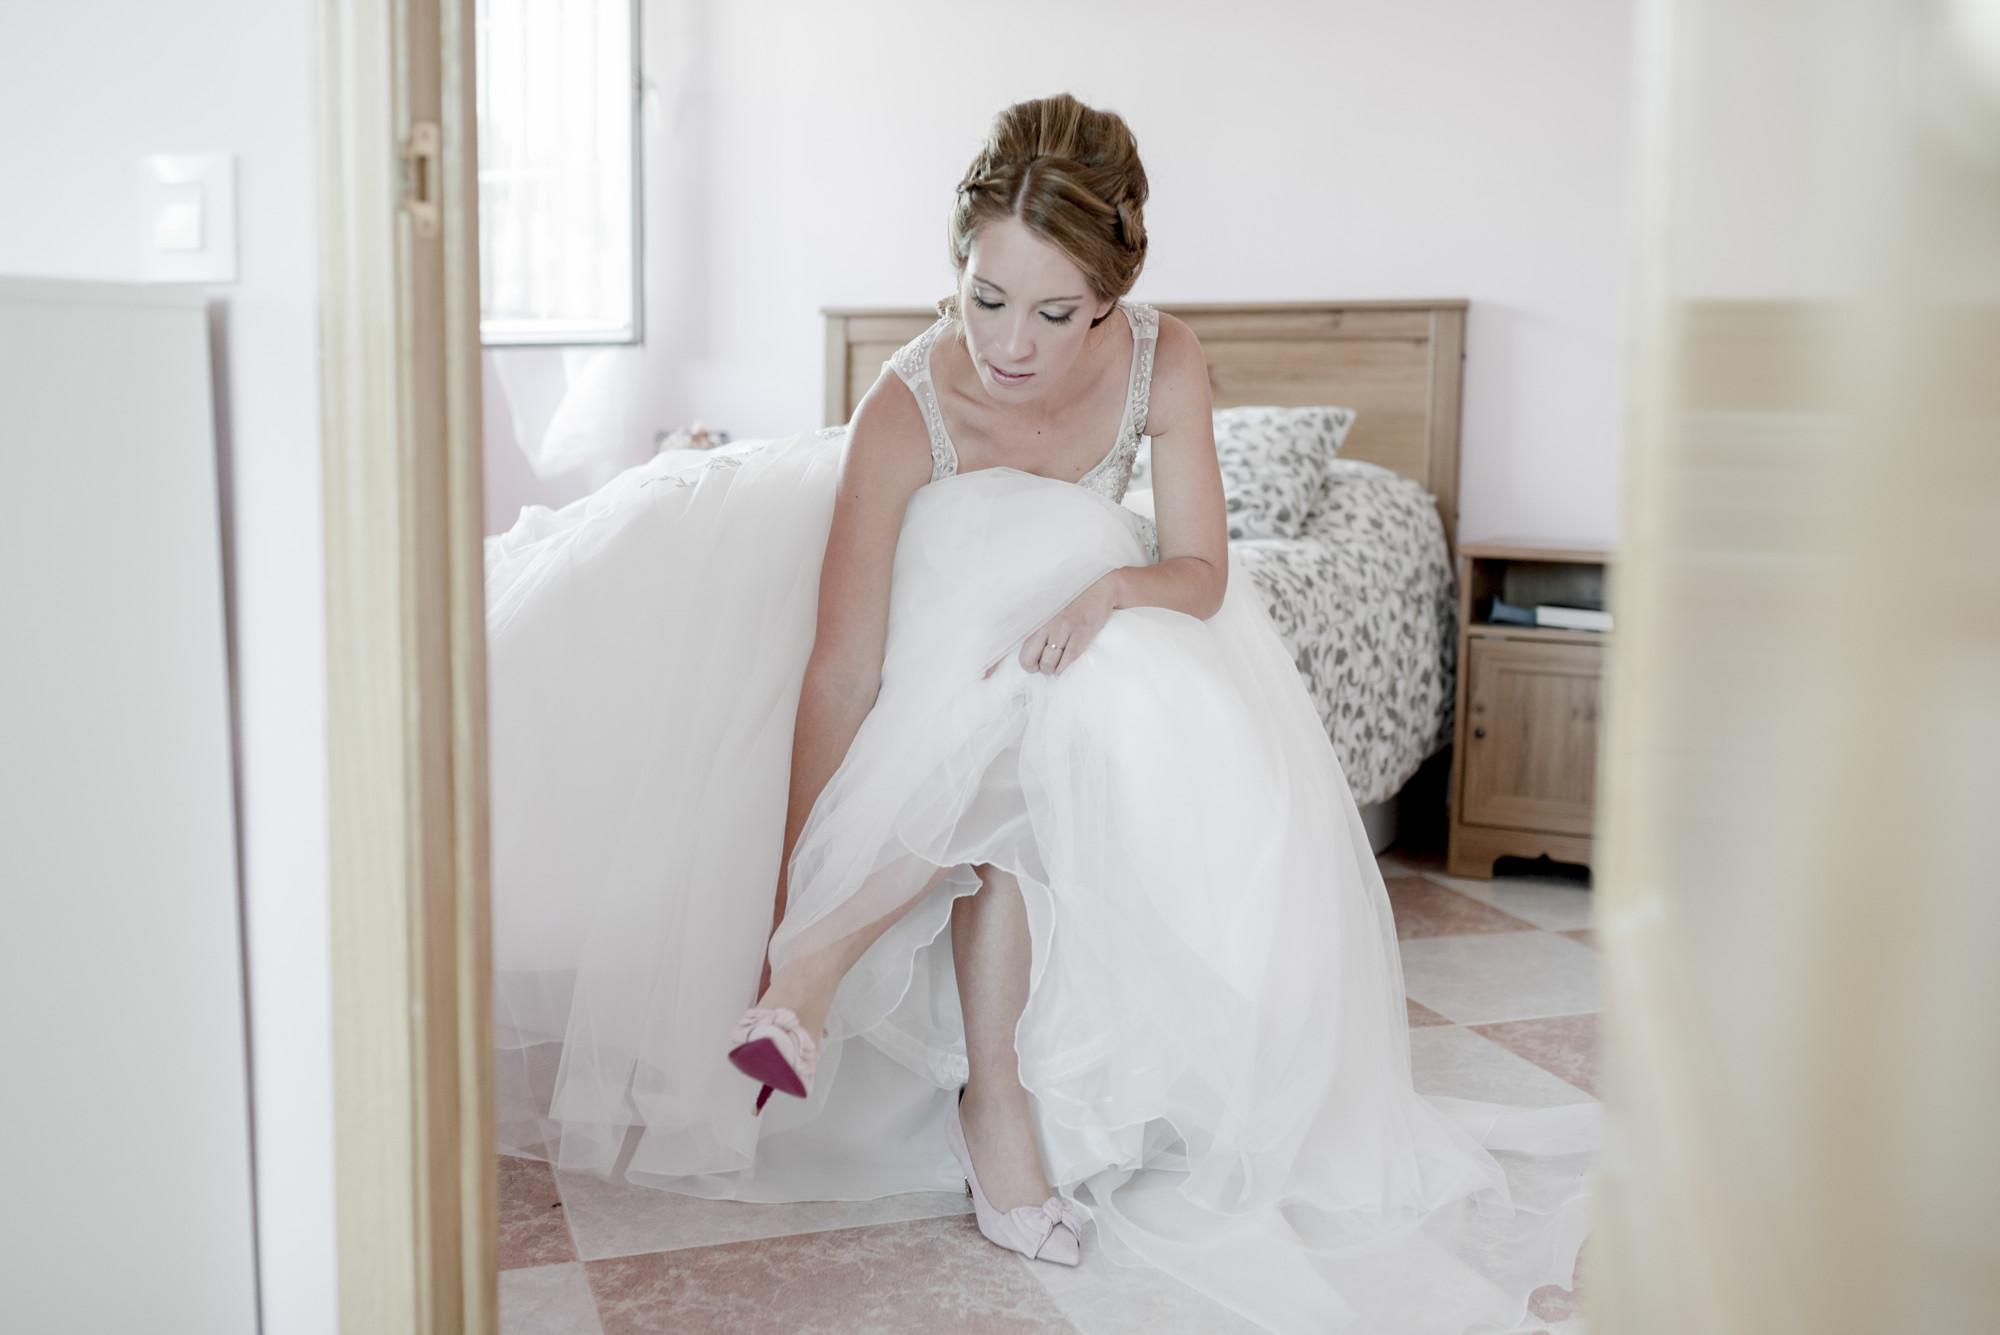 fotografias boda postboda madrid 02